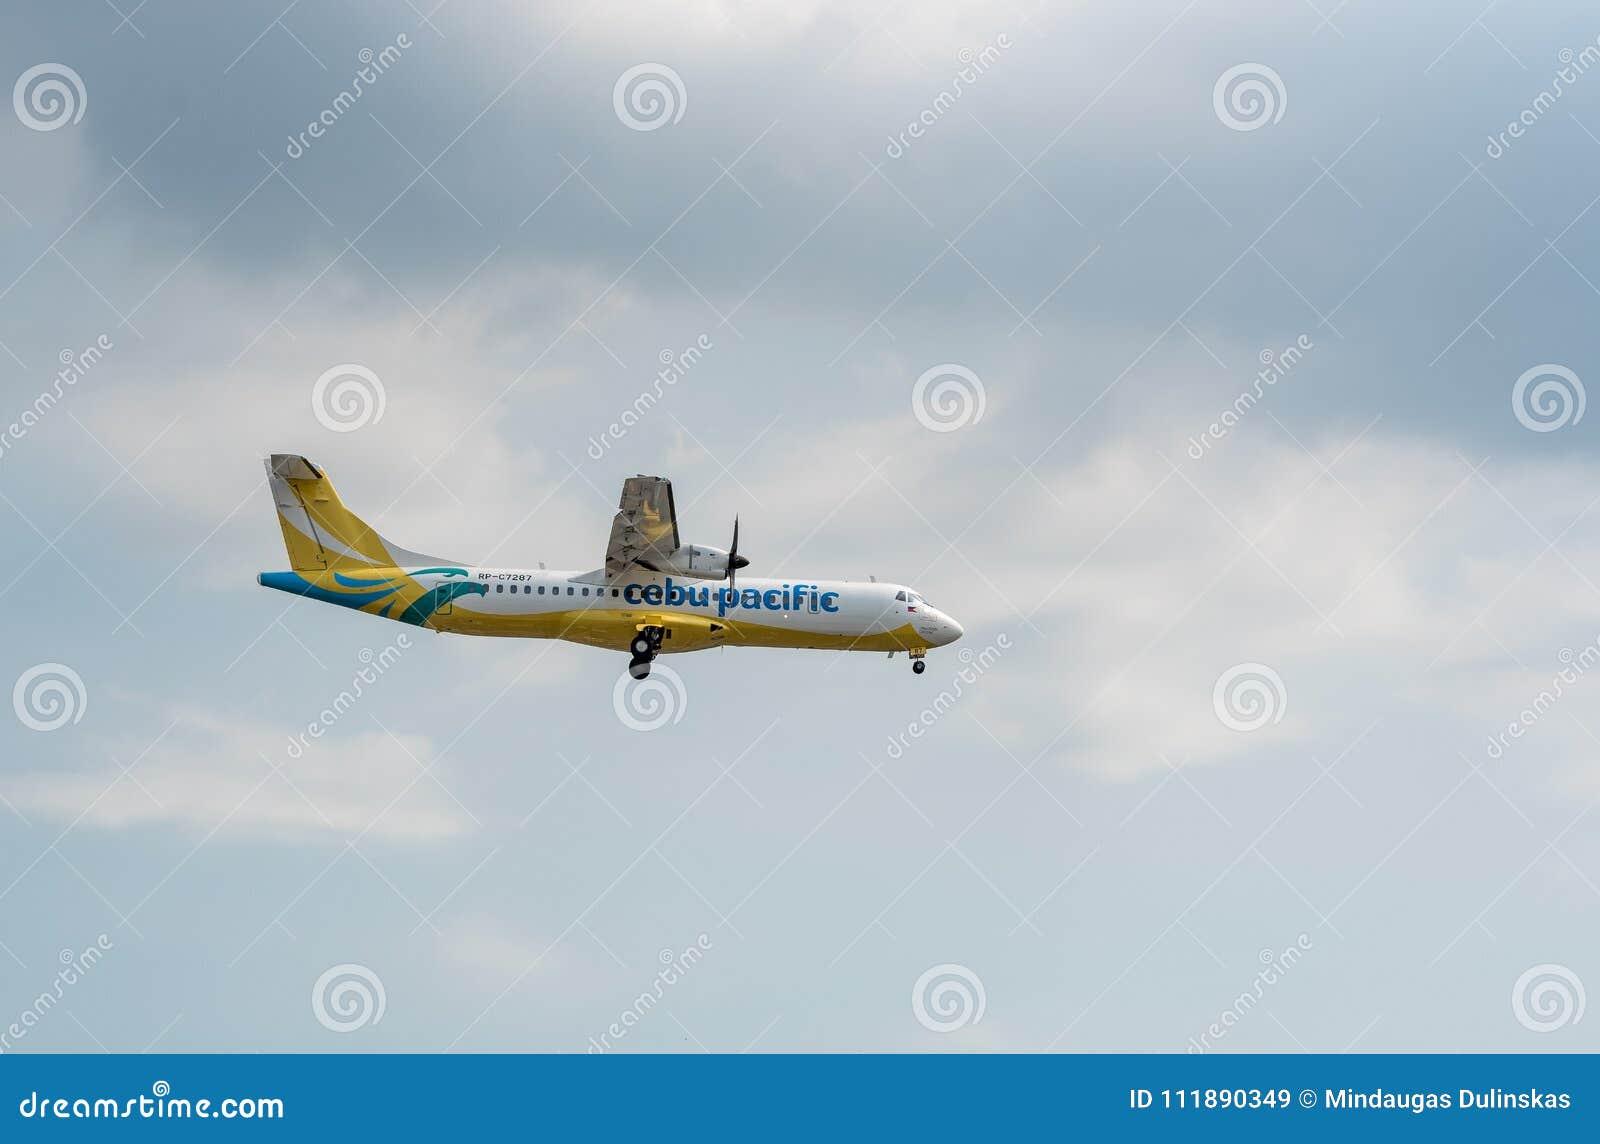 MANILA, PHILIPPINES - FEBRUARY 02, 2018: Cebu Pacific Airlines ATR 72-600 RP-C7287 Landing in Manila International Airport